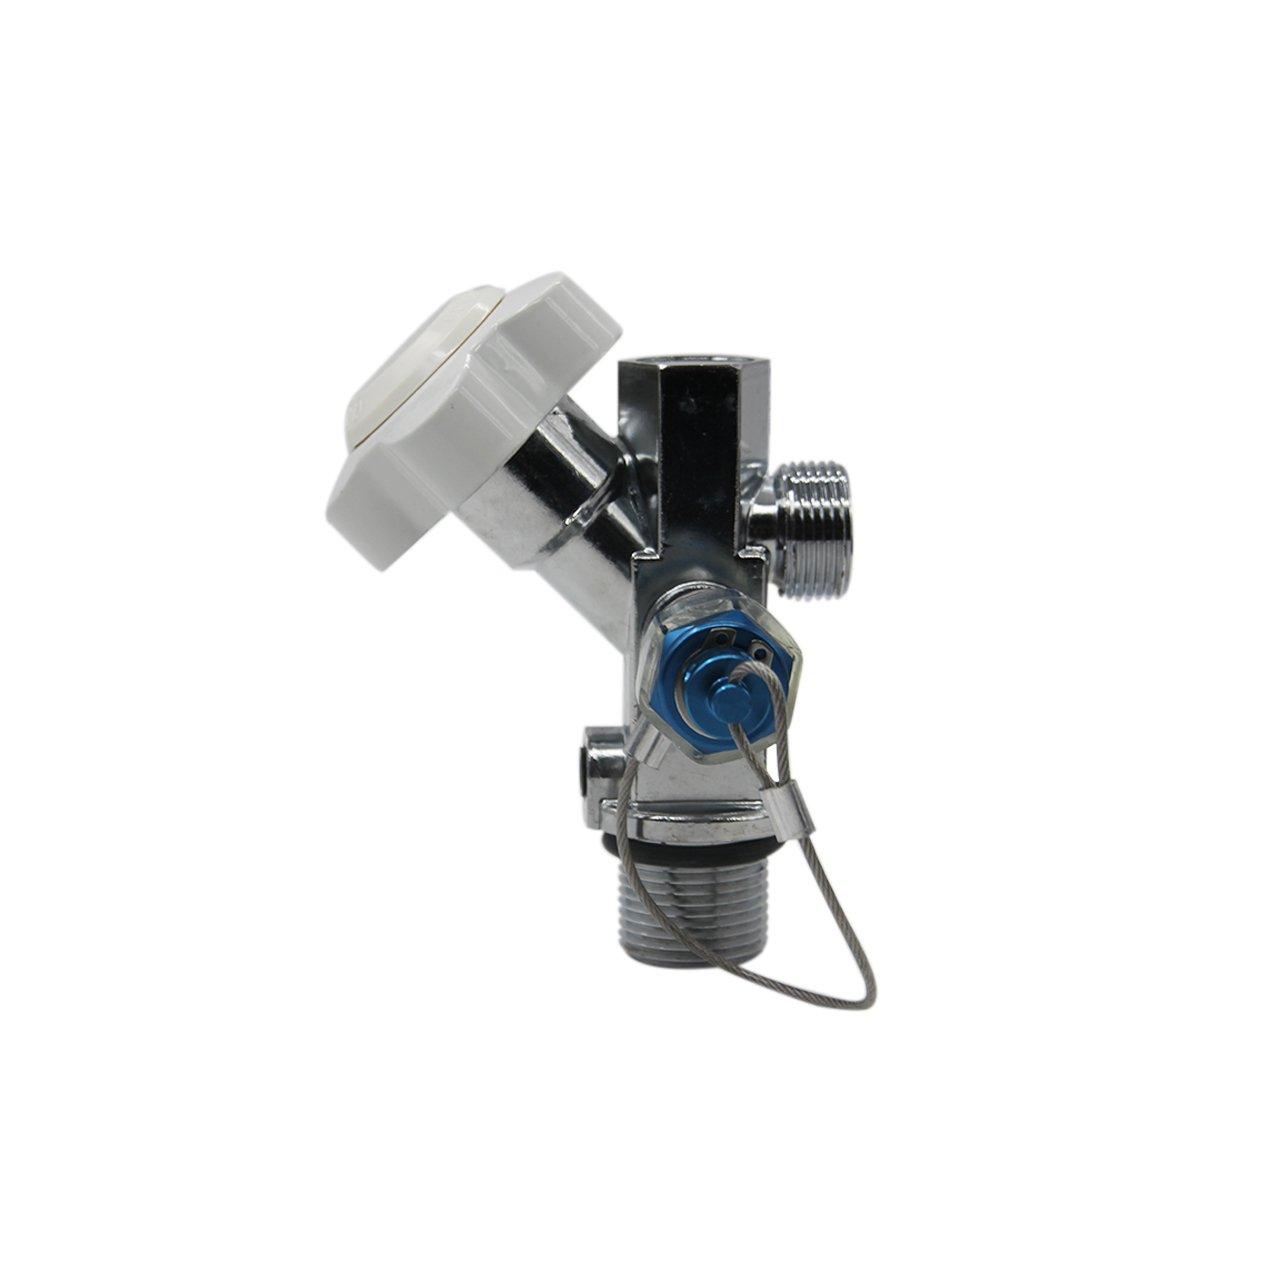 Dracary Nitrous Oxide Systems SUPER Hi-Flo Bottle Valve Work For NOS 16139 (White)